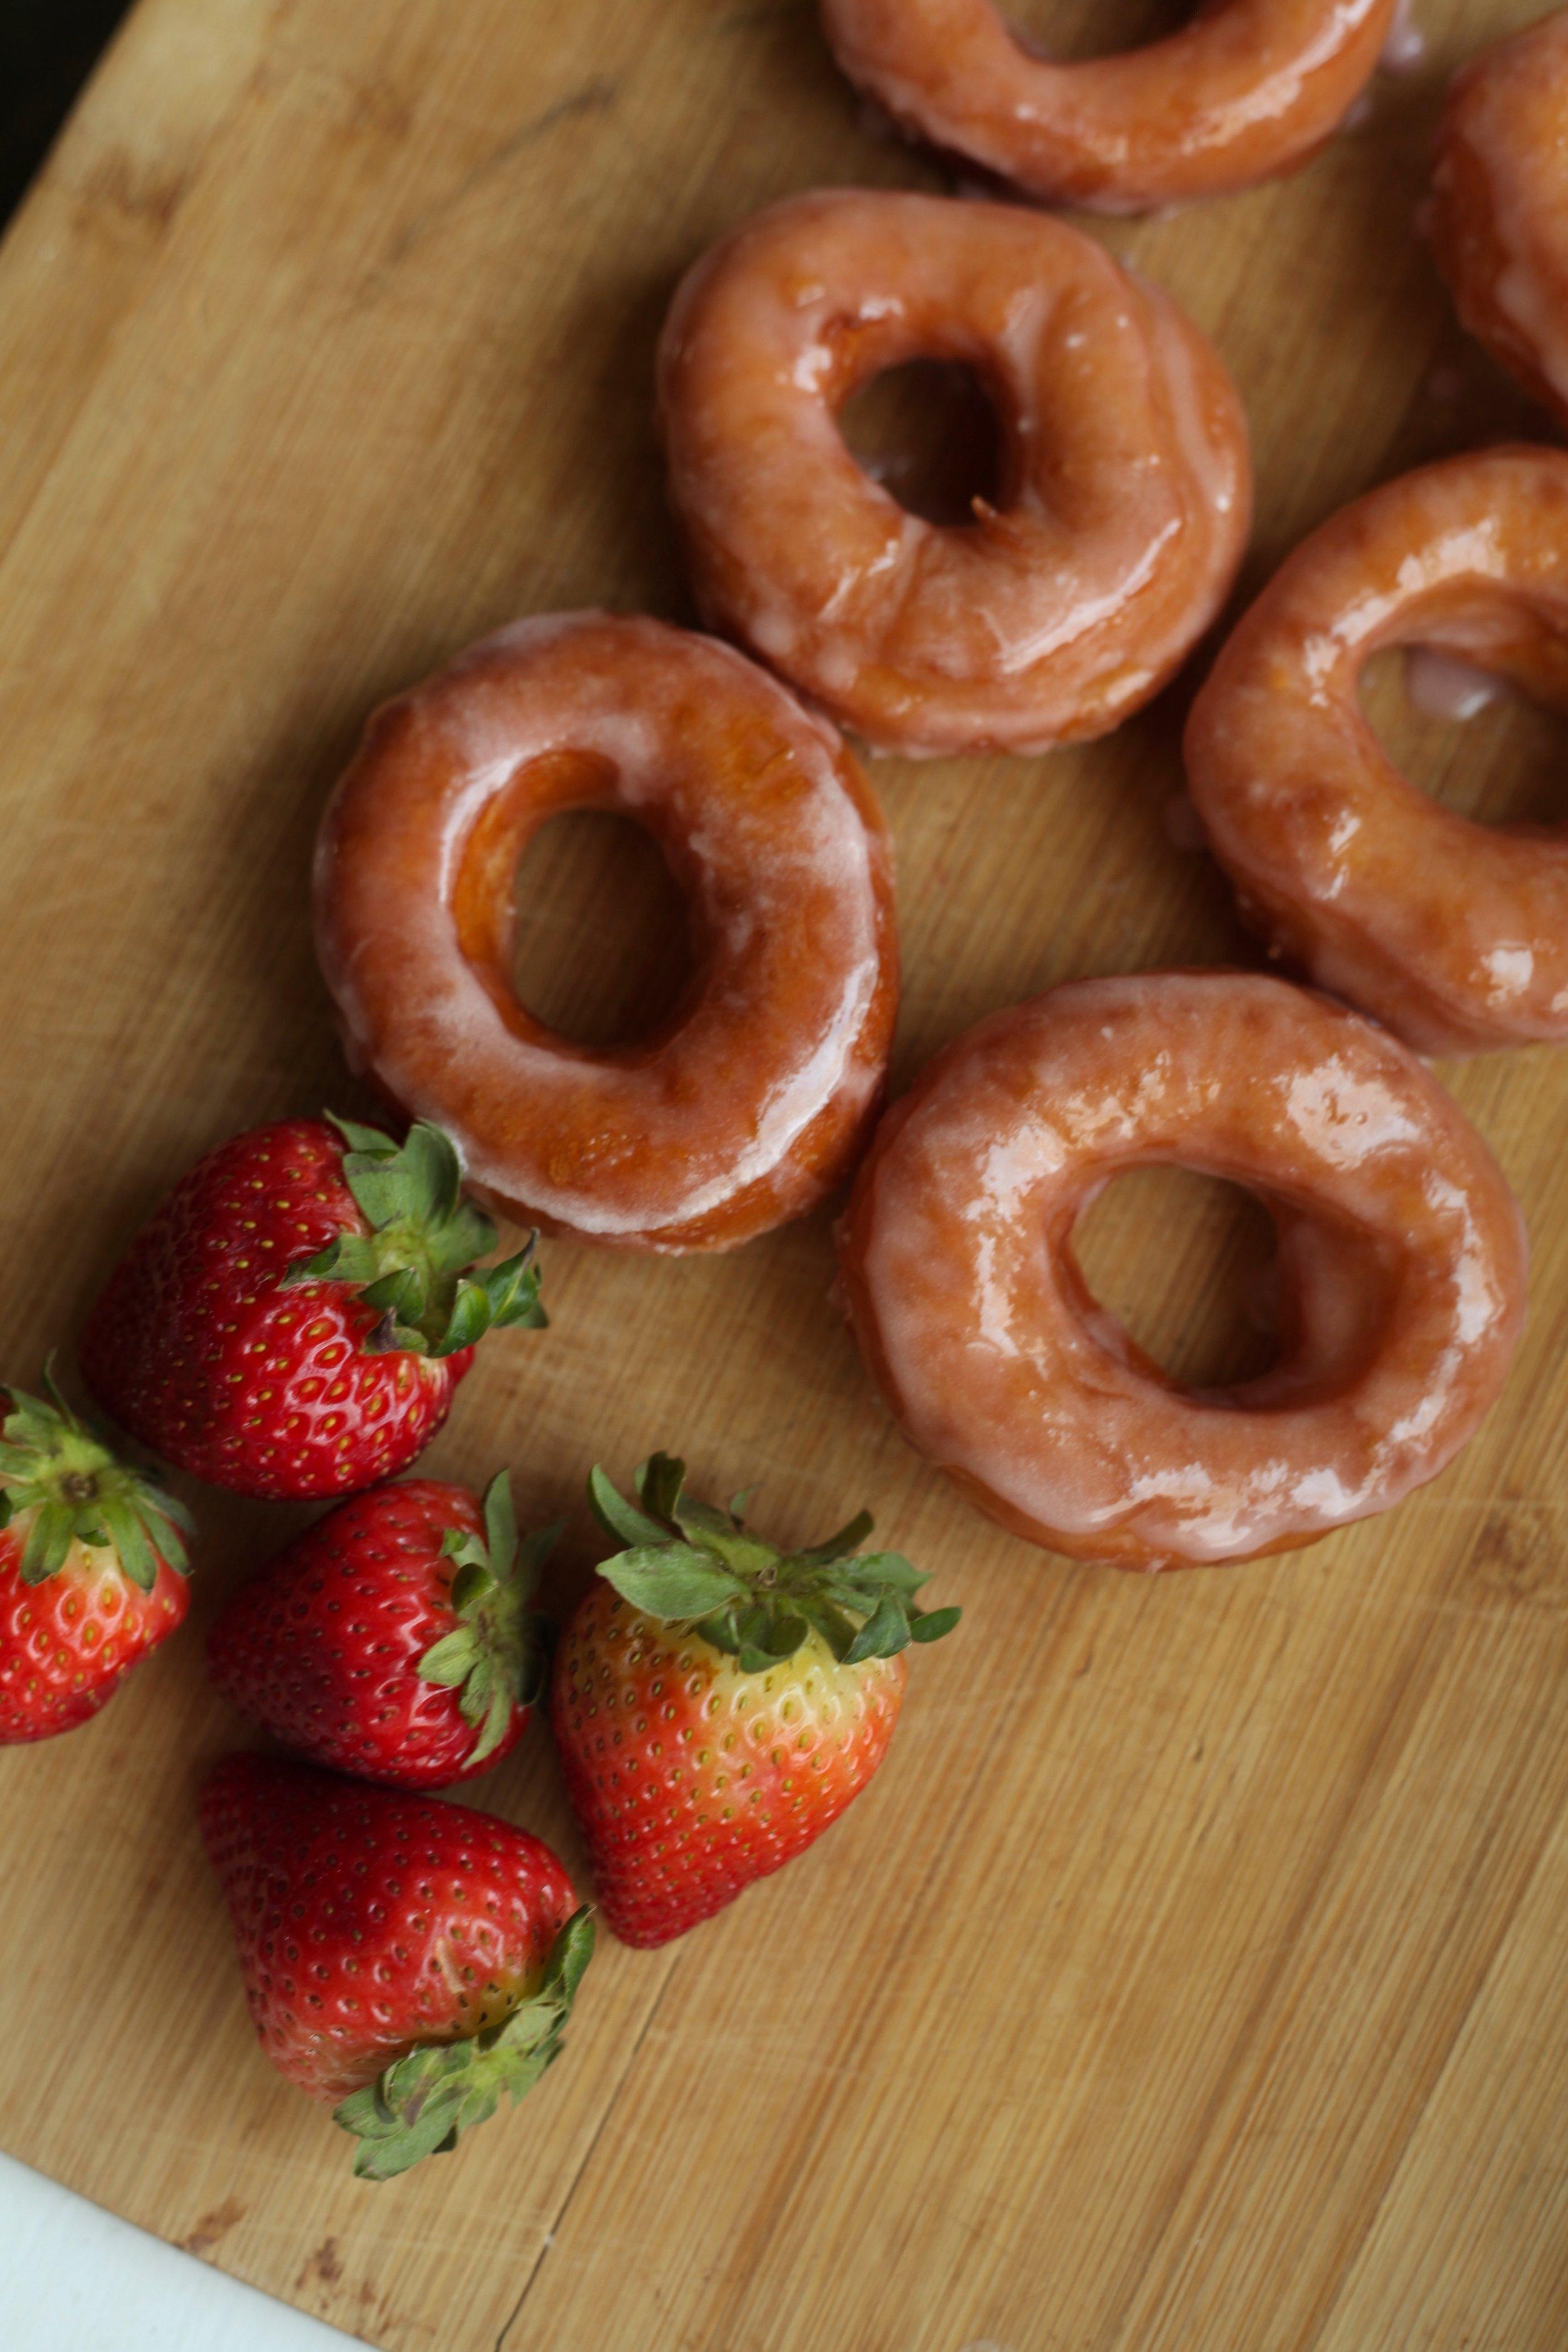 Strawberry Milk Donuts 4